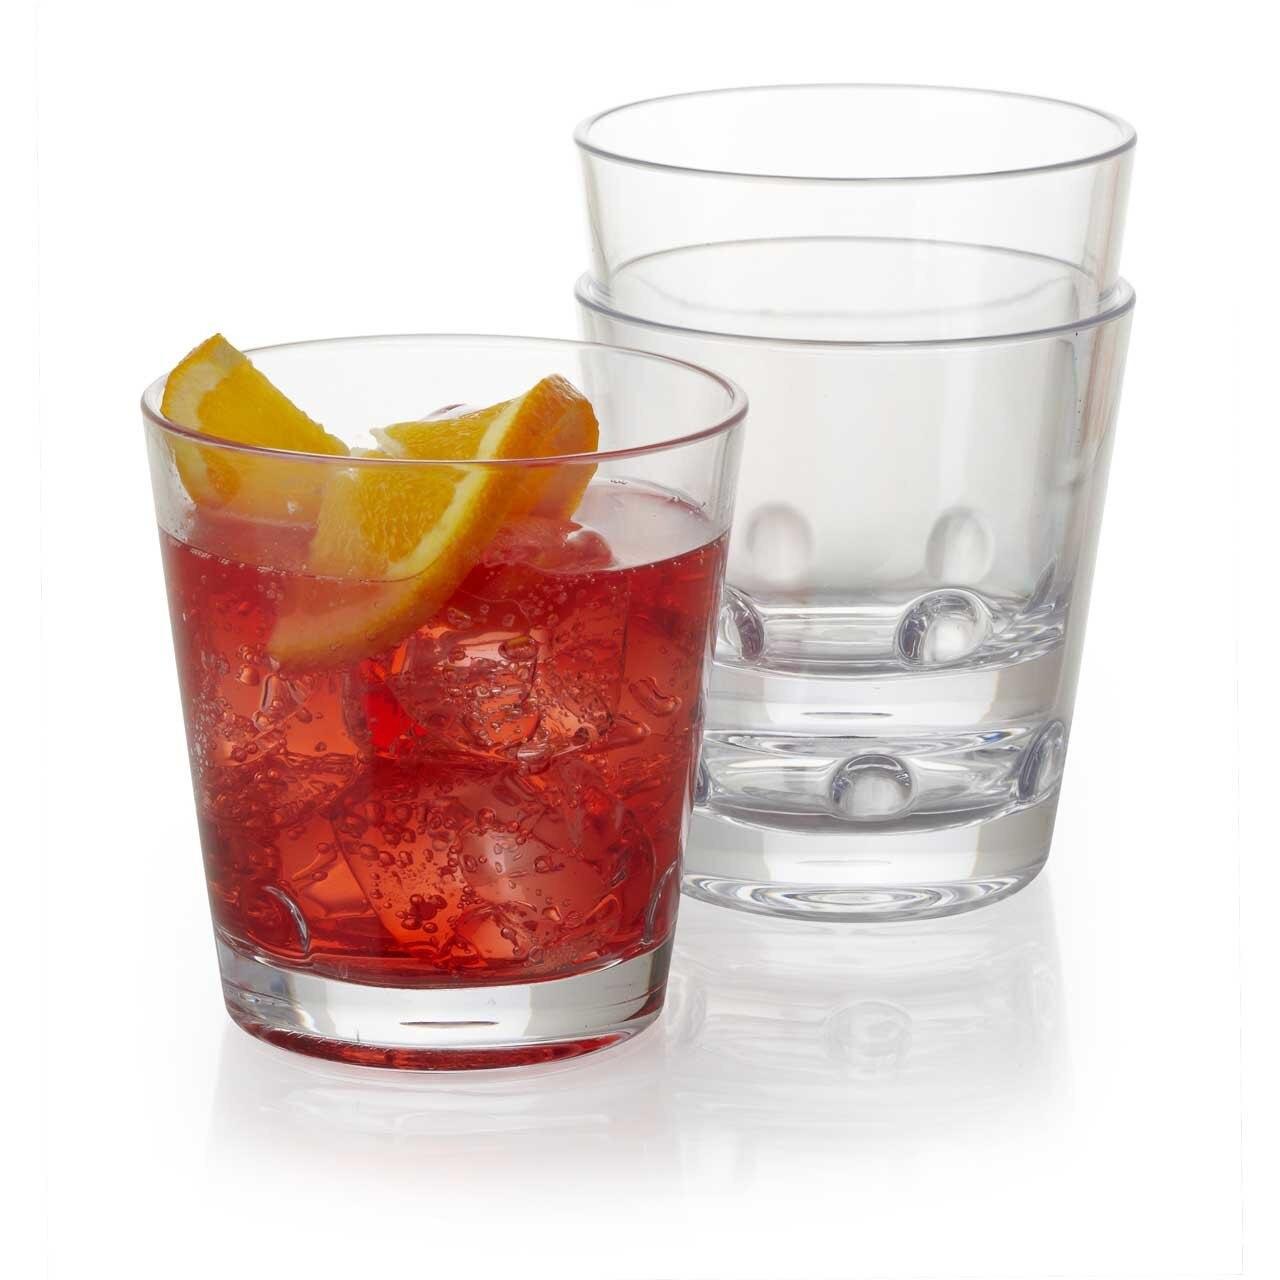 9, 12, or 16 oz. Plastic Drinking Glass, Set of 4 - Loft